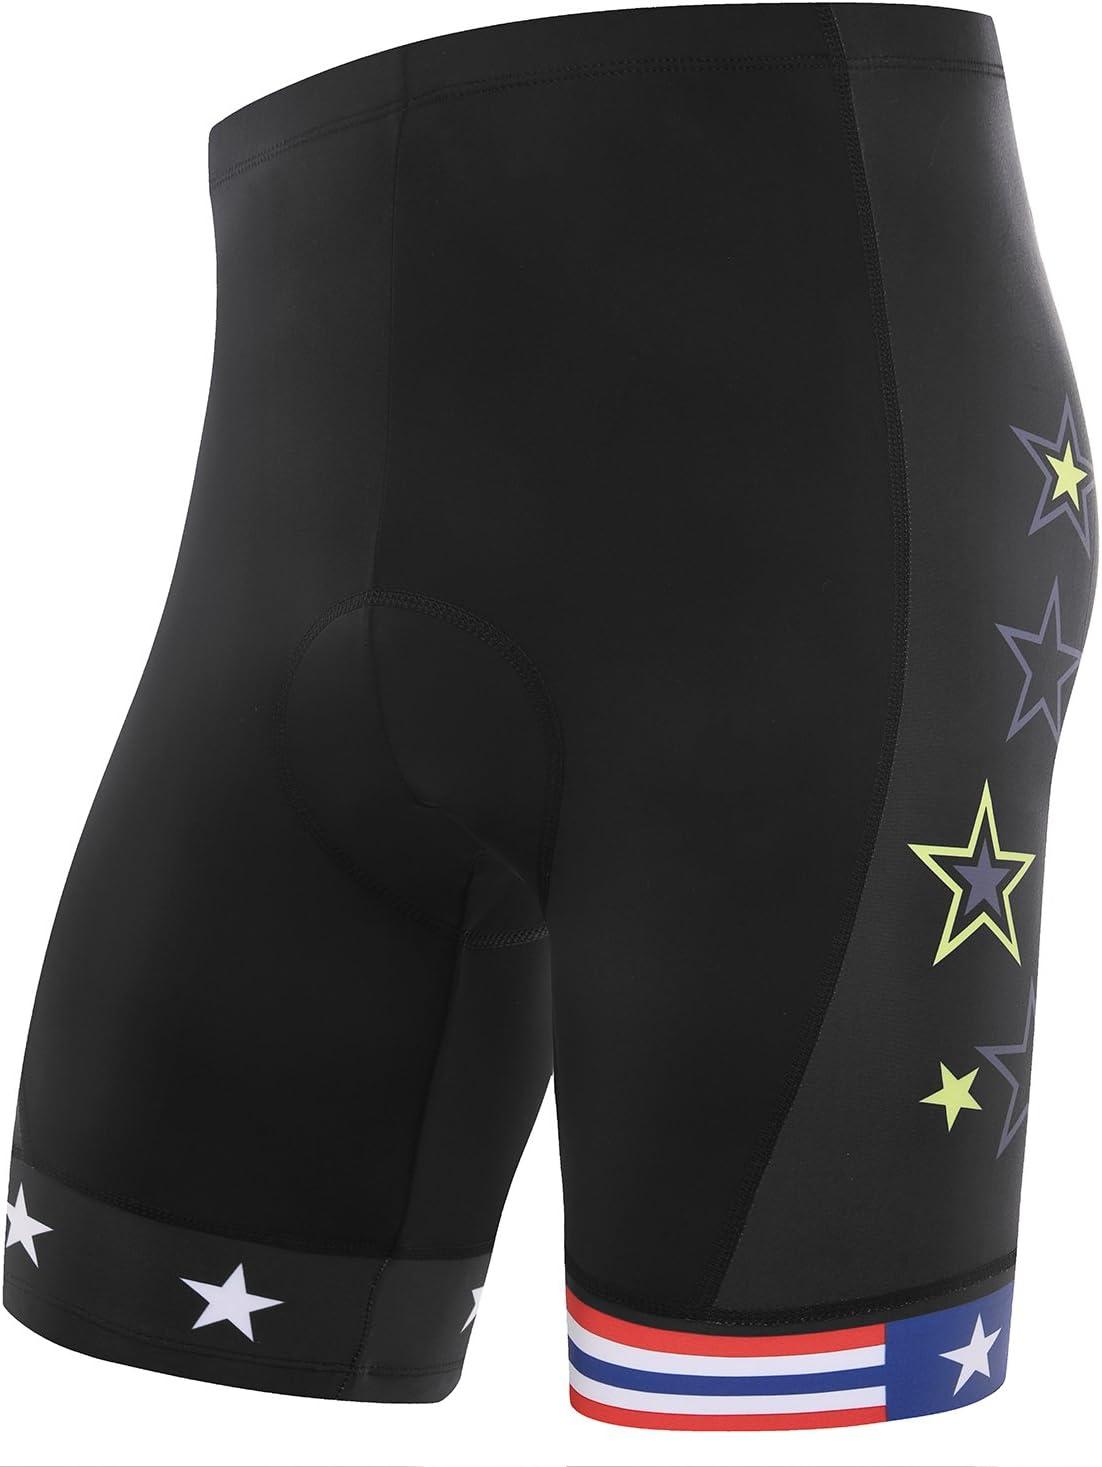 Bpbtti Men/'s Mountain Bike Shorts 3D Padded MTB Cycling Shorts-The Enduro Baggy Shorts